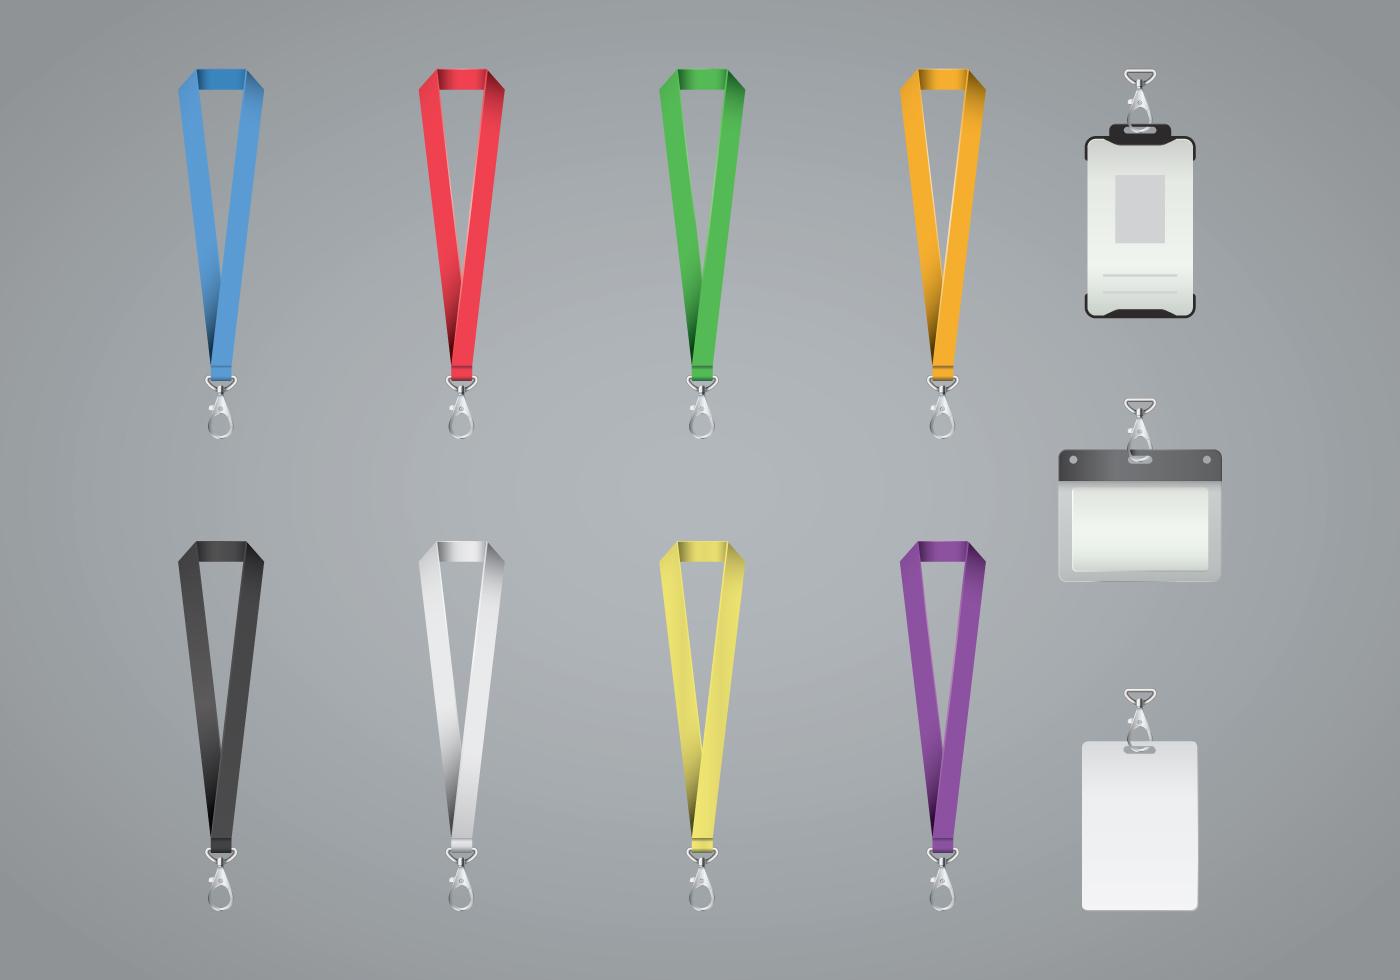 Free Lanyard And Badge Vector - Download Free Vector Art, Stock ...